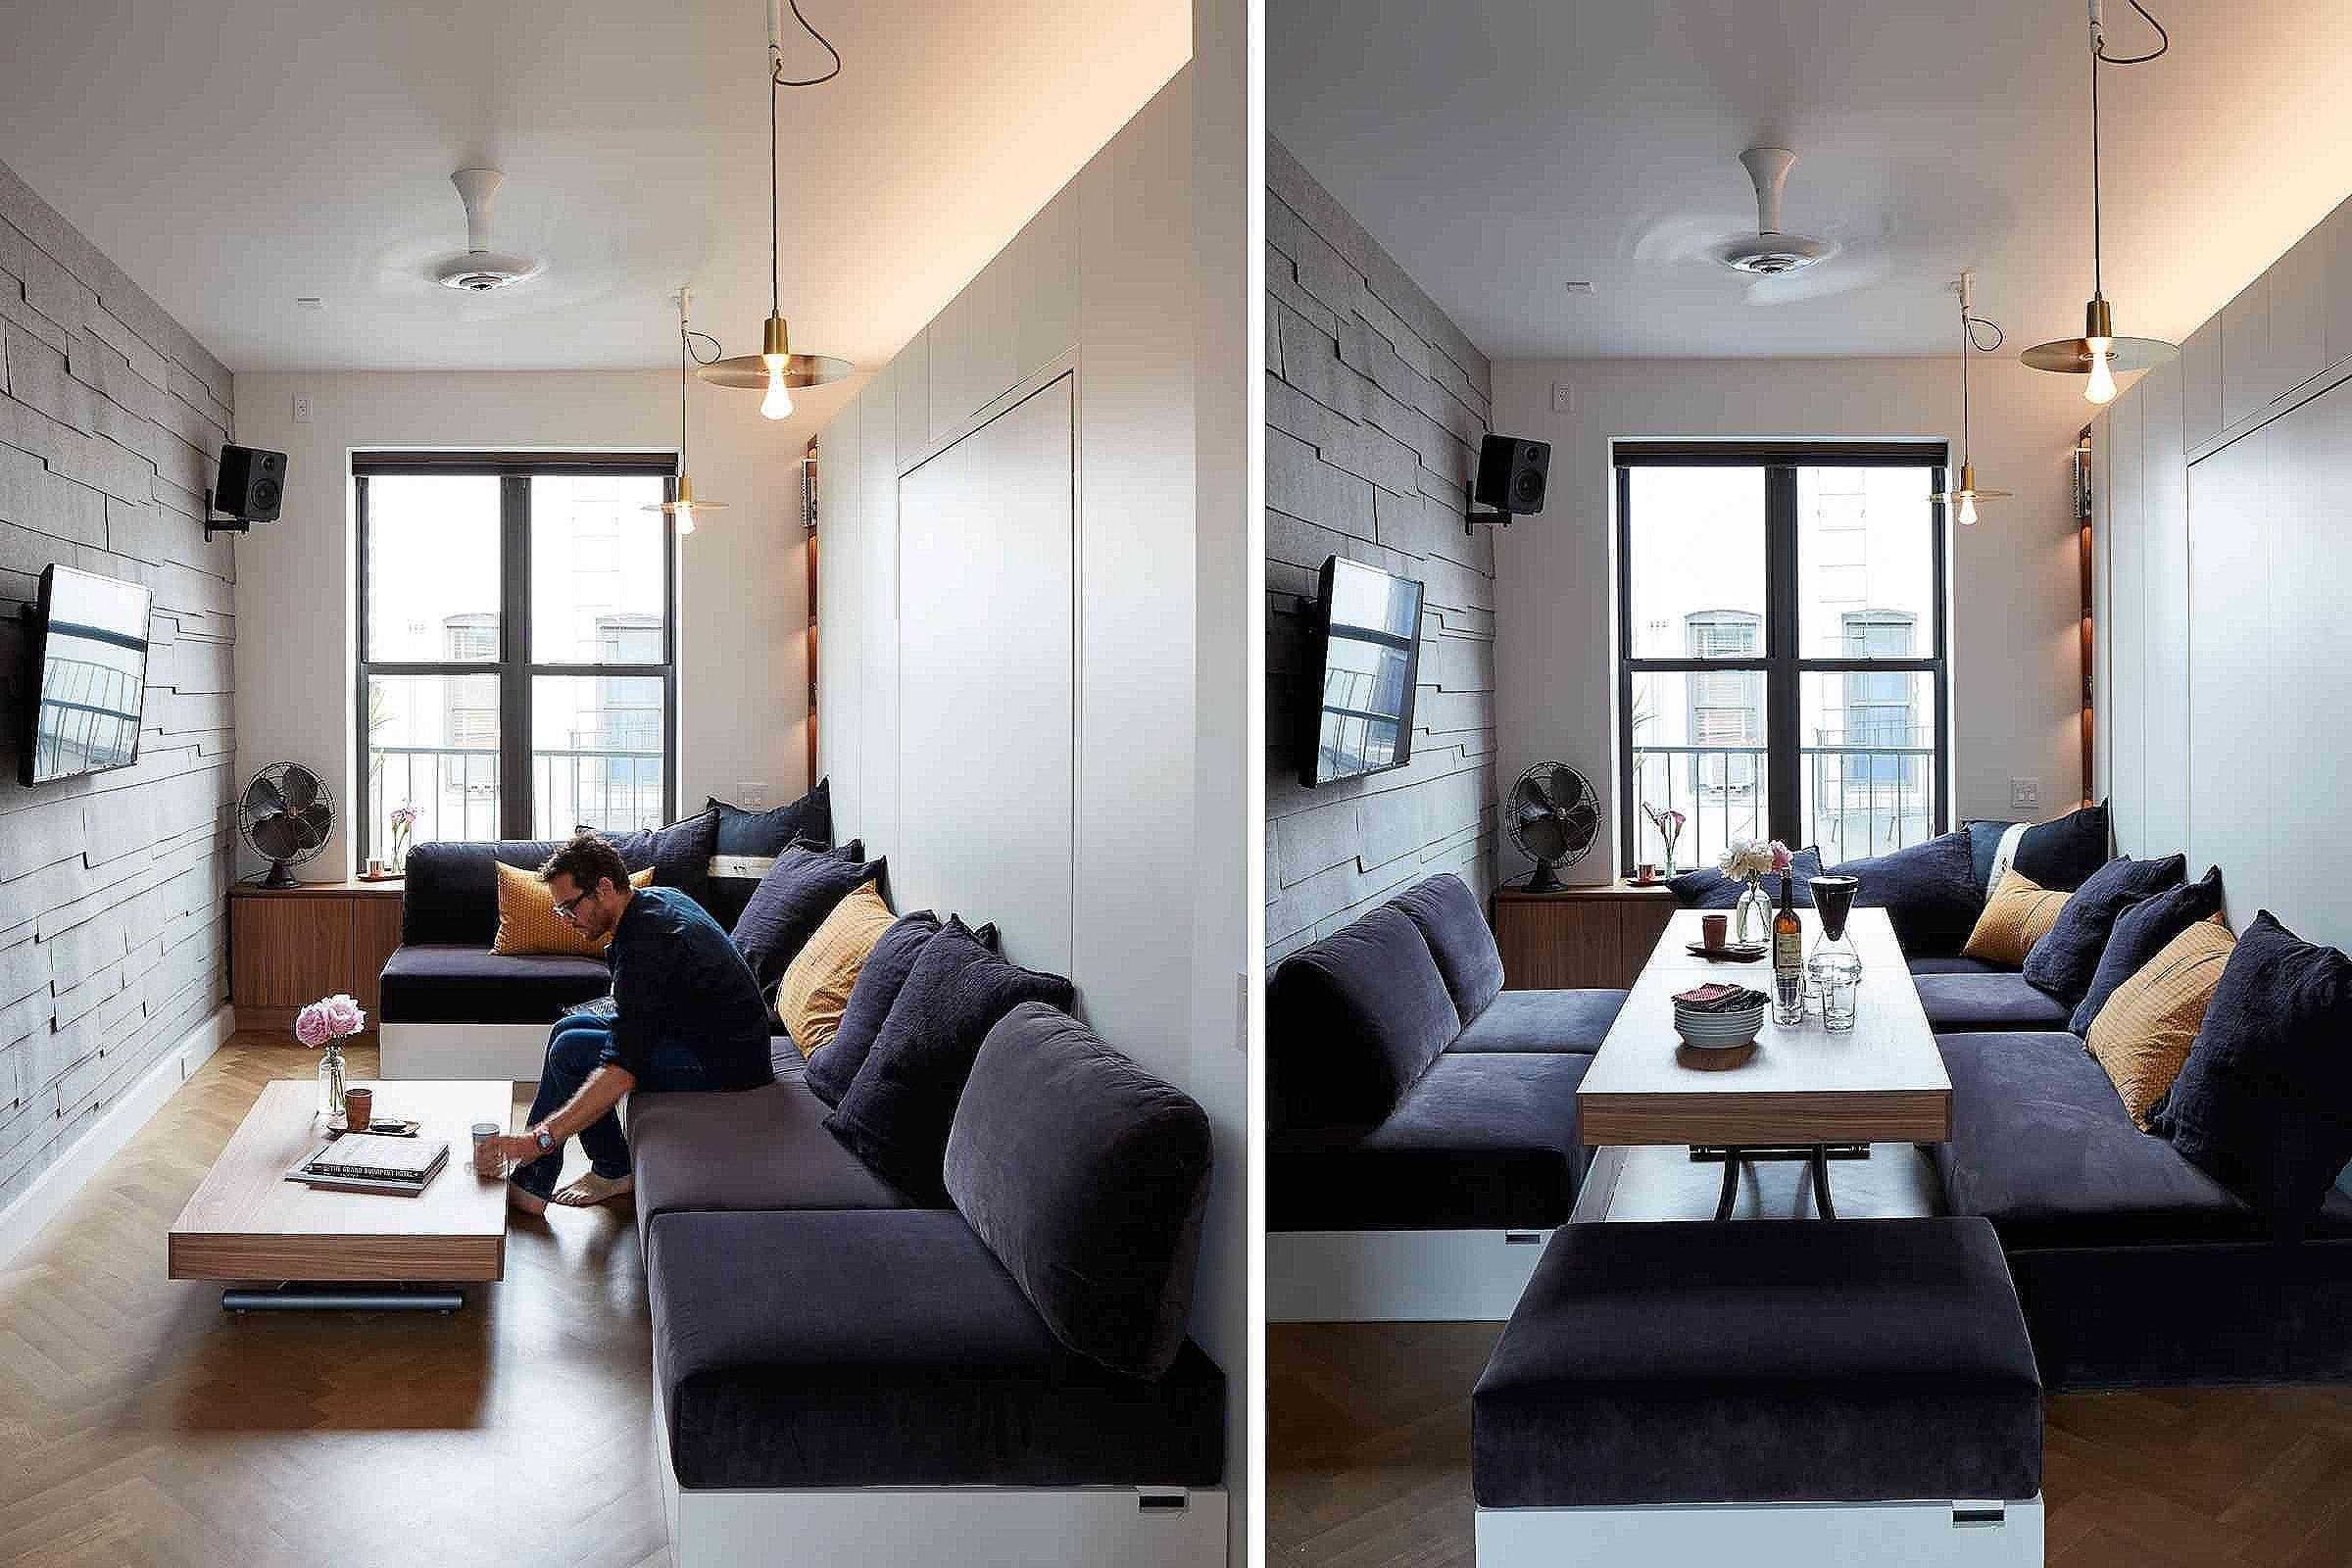 #apartmentlivingforcollegestudents #apartmentlivingorhouse ...